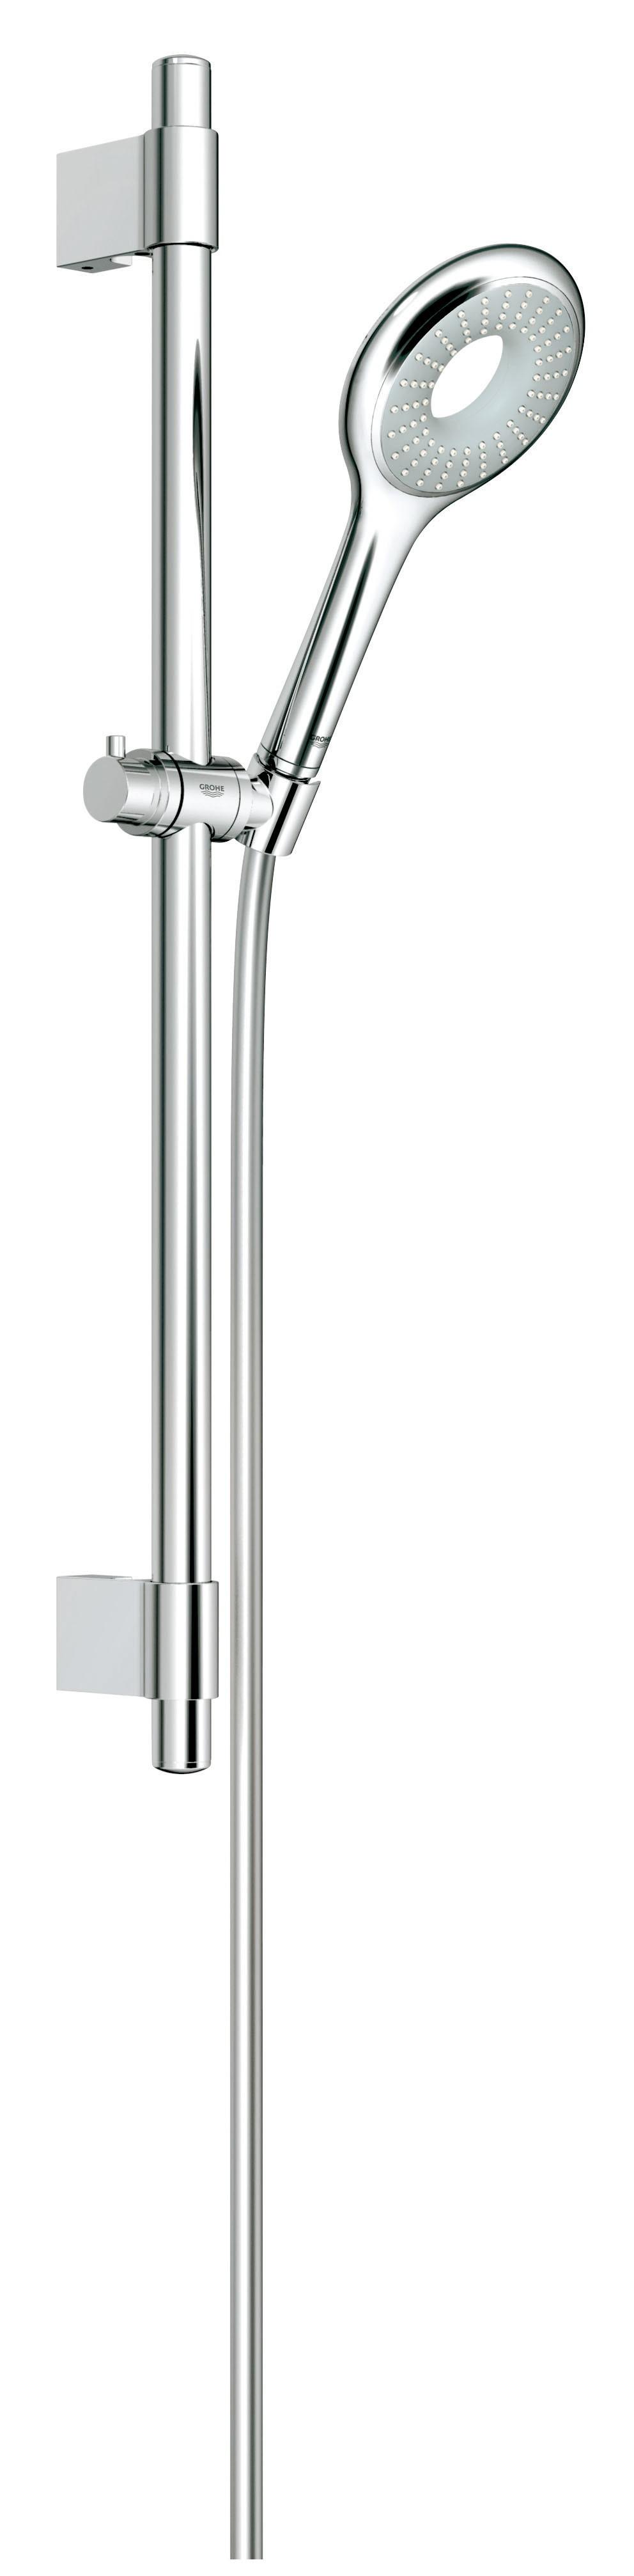 Grohe 27529000 Rainshower Icon 100 (ручной душ, штанга 600 мм, шланг 1750 мм), хром